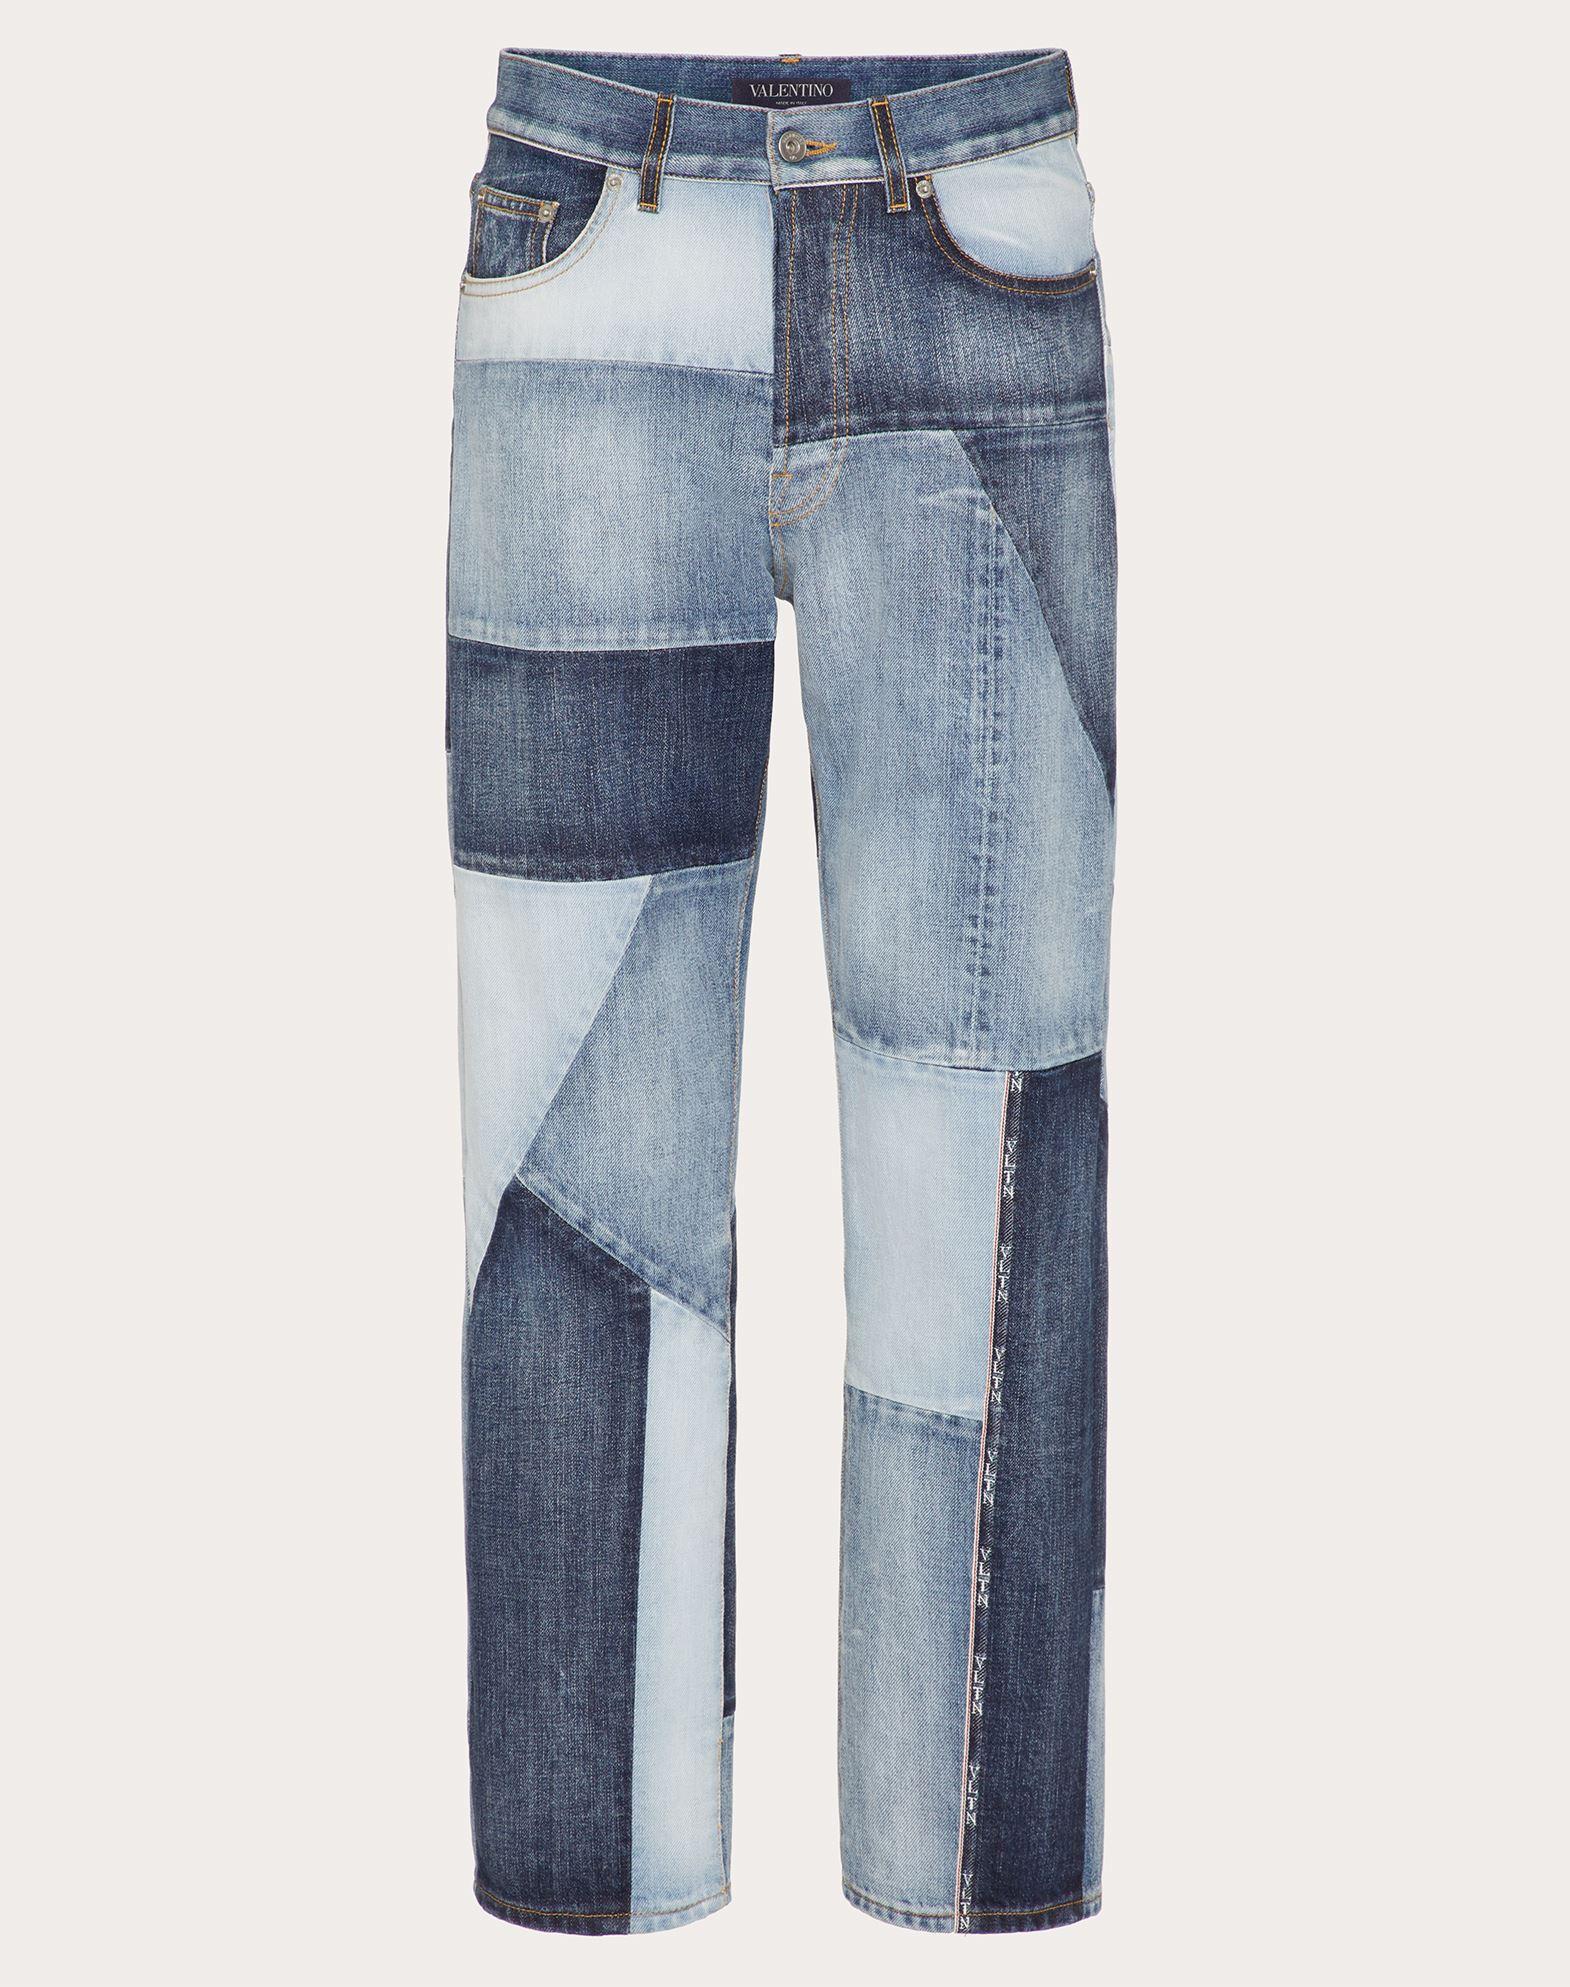 Valentino Uomo Denim Patchwork Pants In Blue